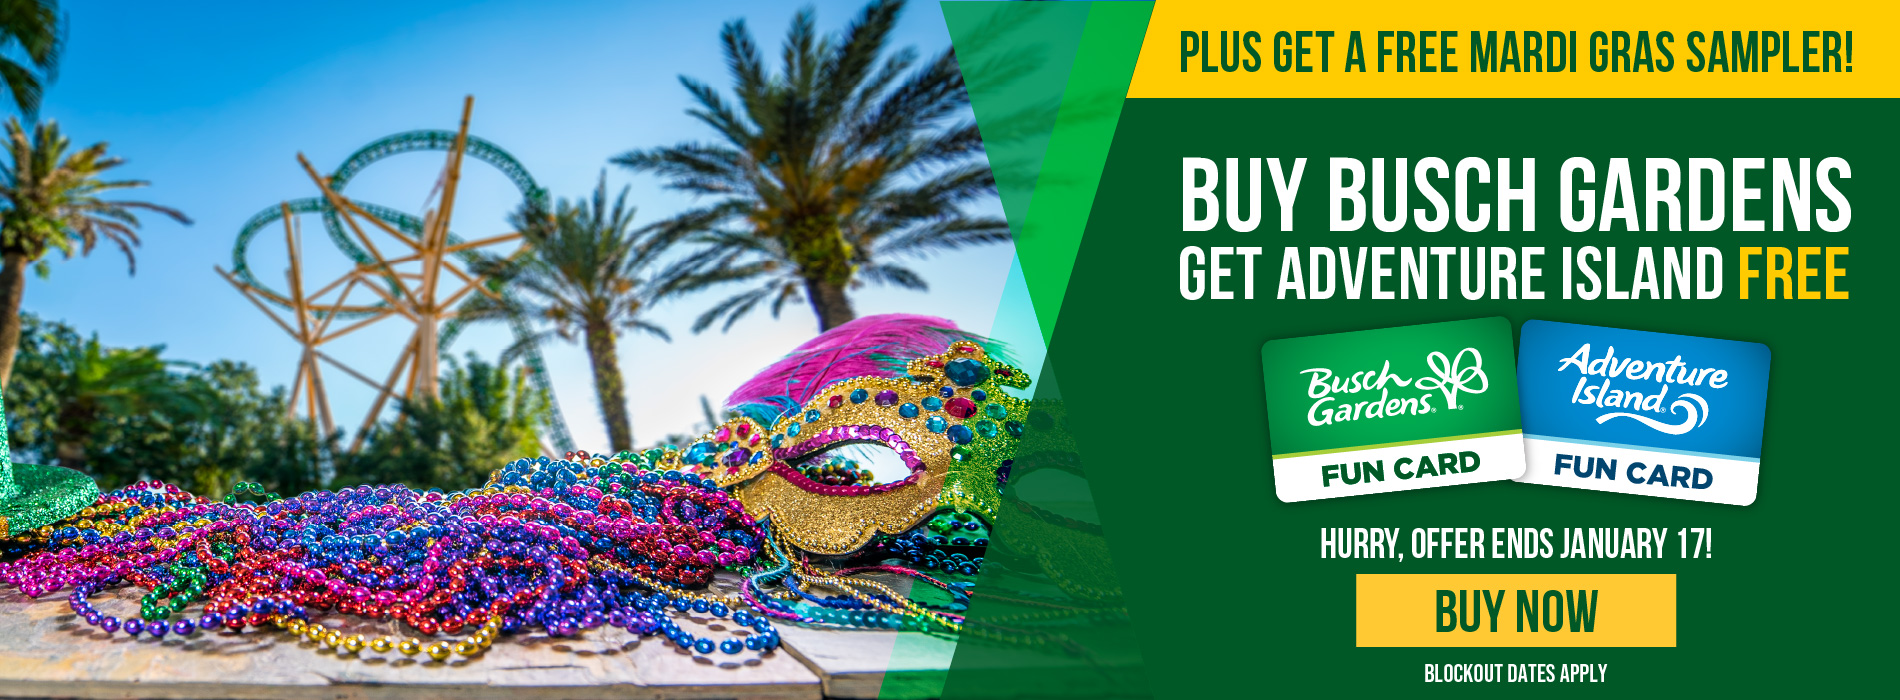 Buy Busch Gardens Get Adventure Island Free. Plus get a Free Mardi Gras Sampler. Hurry, offer ends January 17!